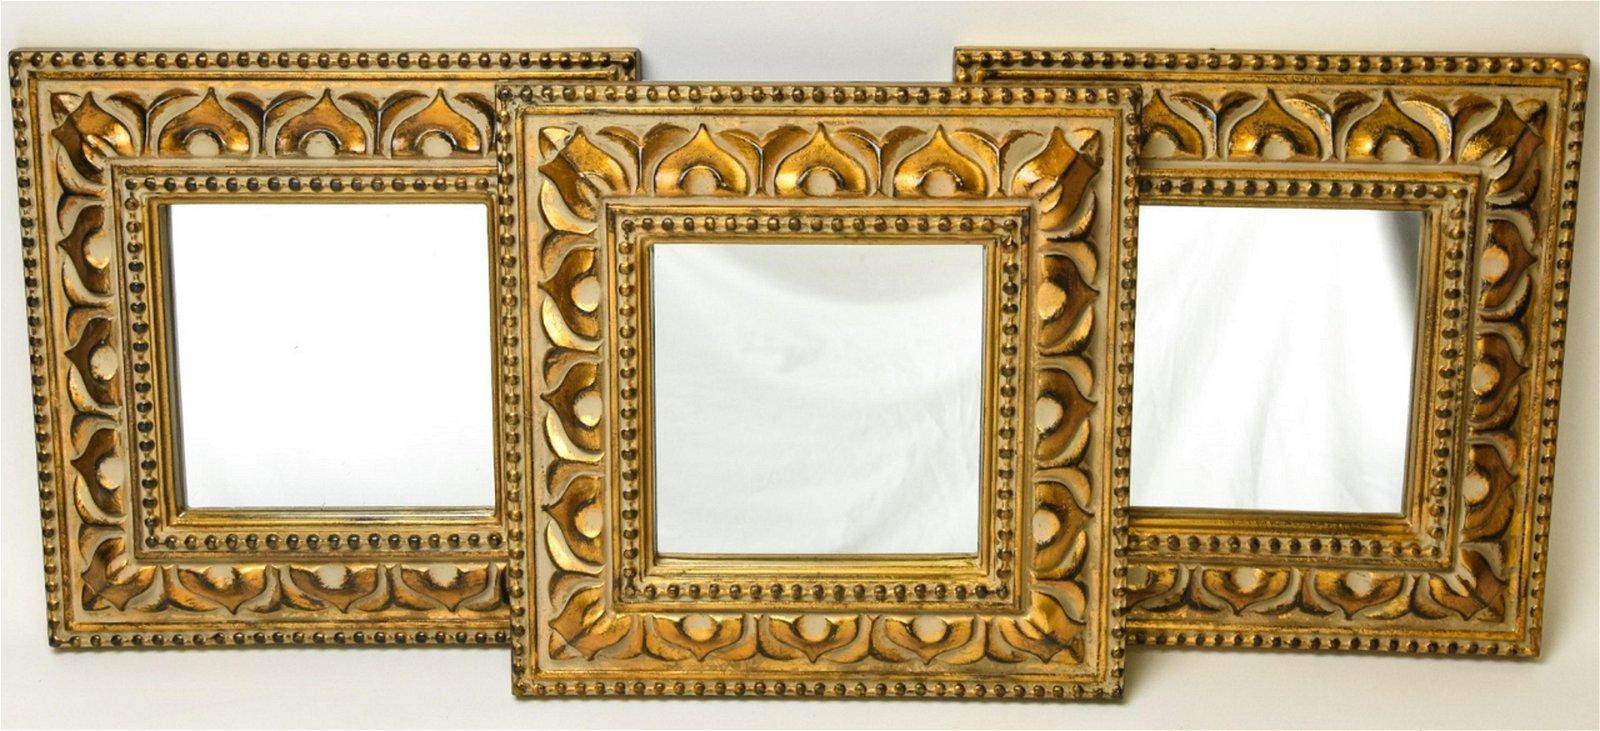 3 Contemporary Rococo Influence Mirrors